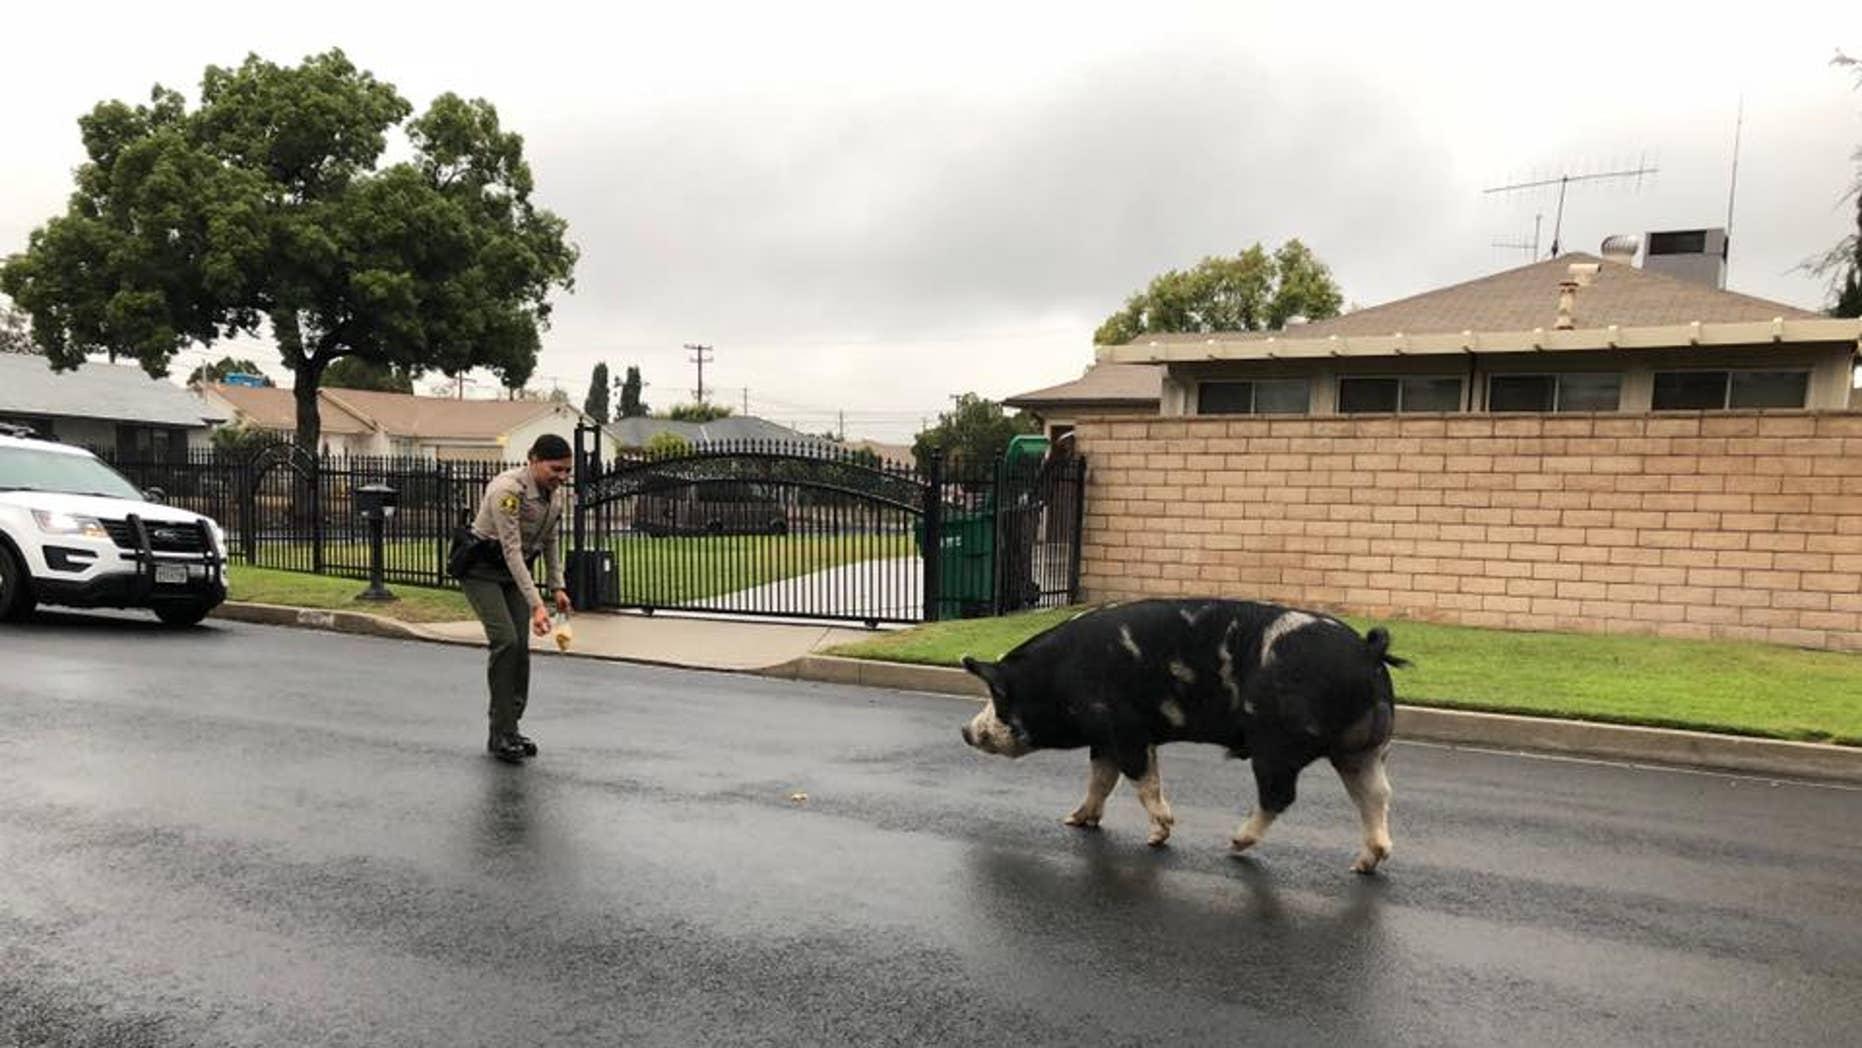 Deputies in San Bernardino, California lured a pig back home with a trail of Doritos.